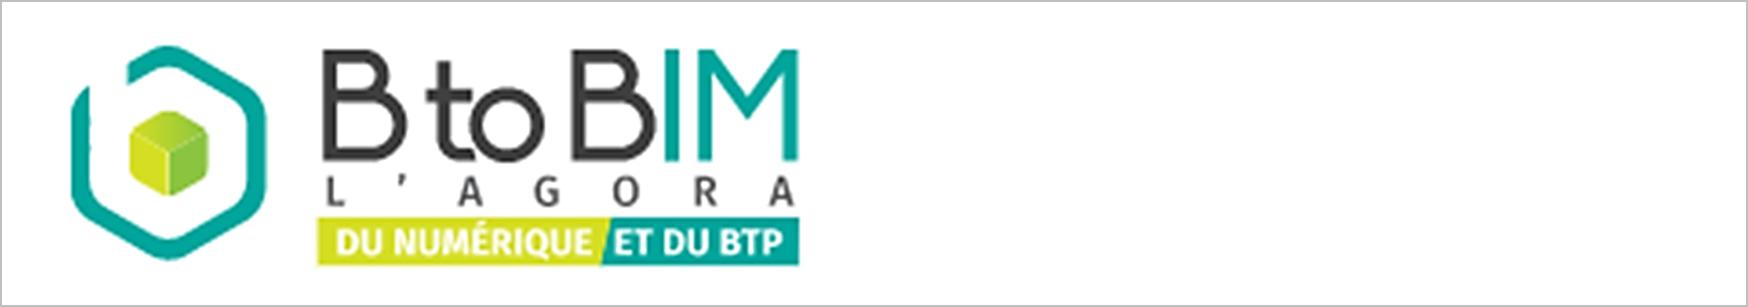 BtoBim nantes web banner